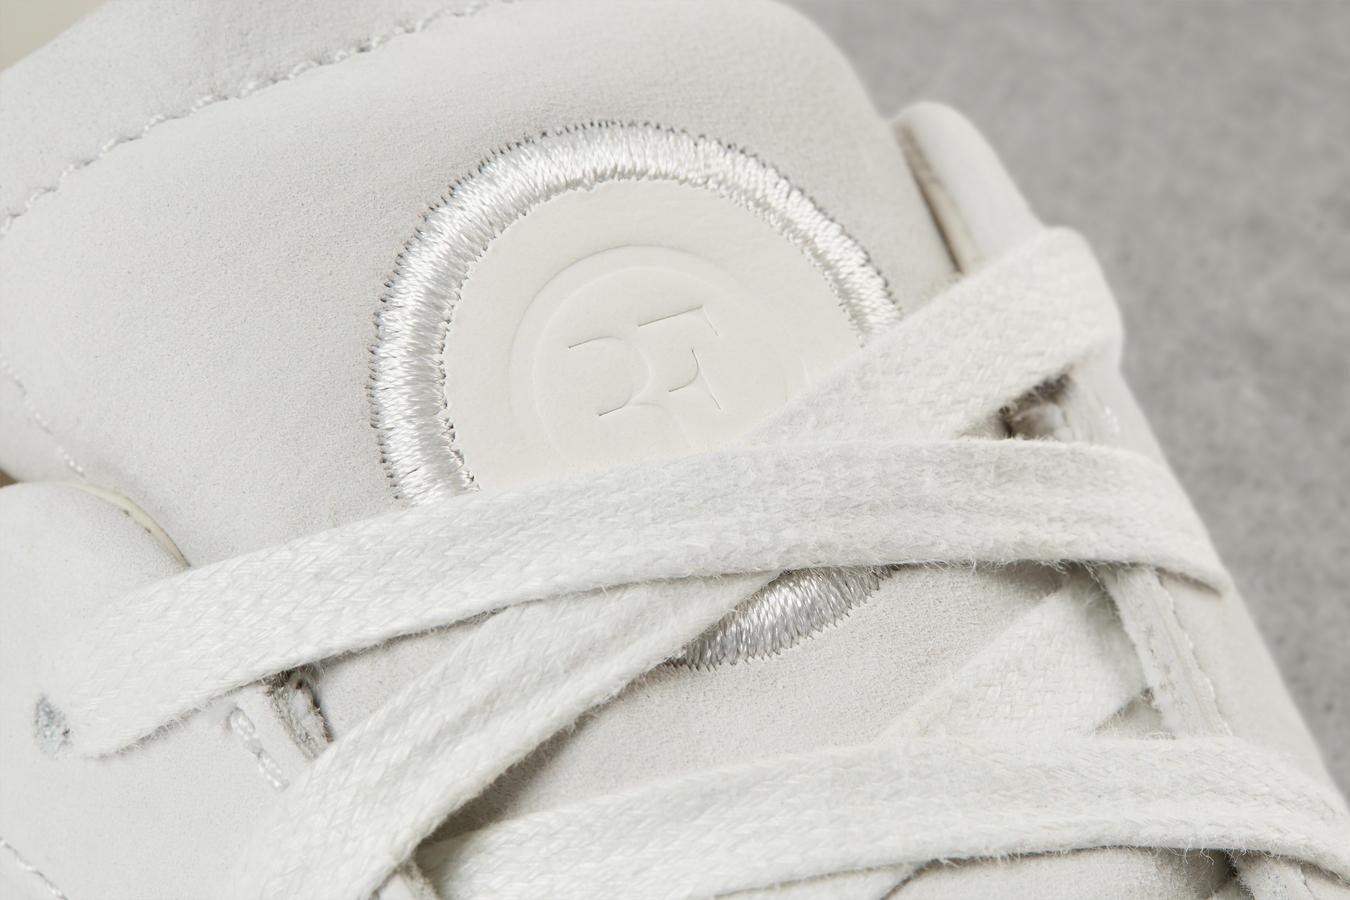 NikeCourt Oscillate Evolve x RF